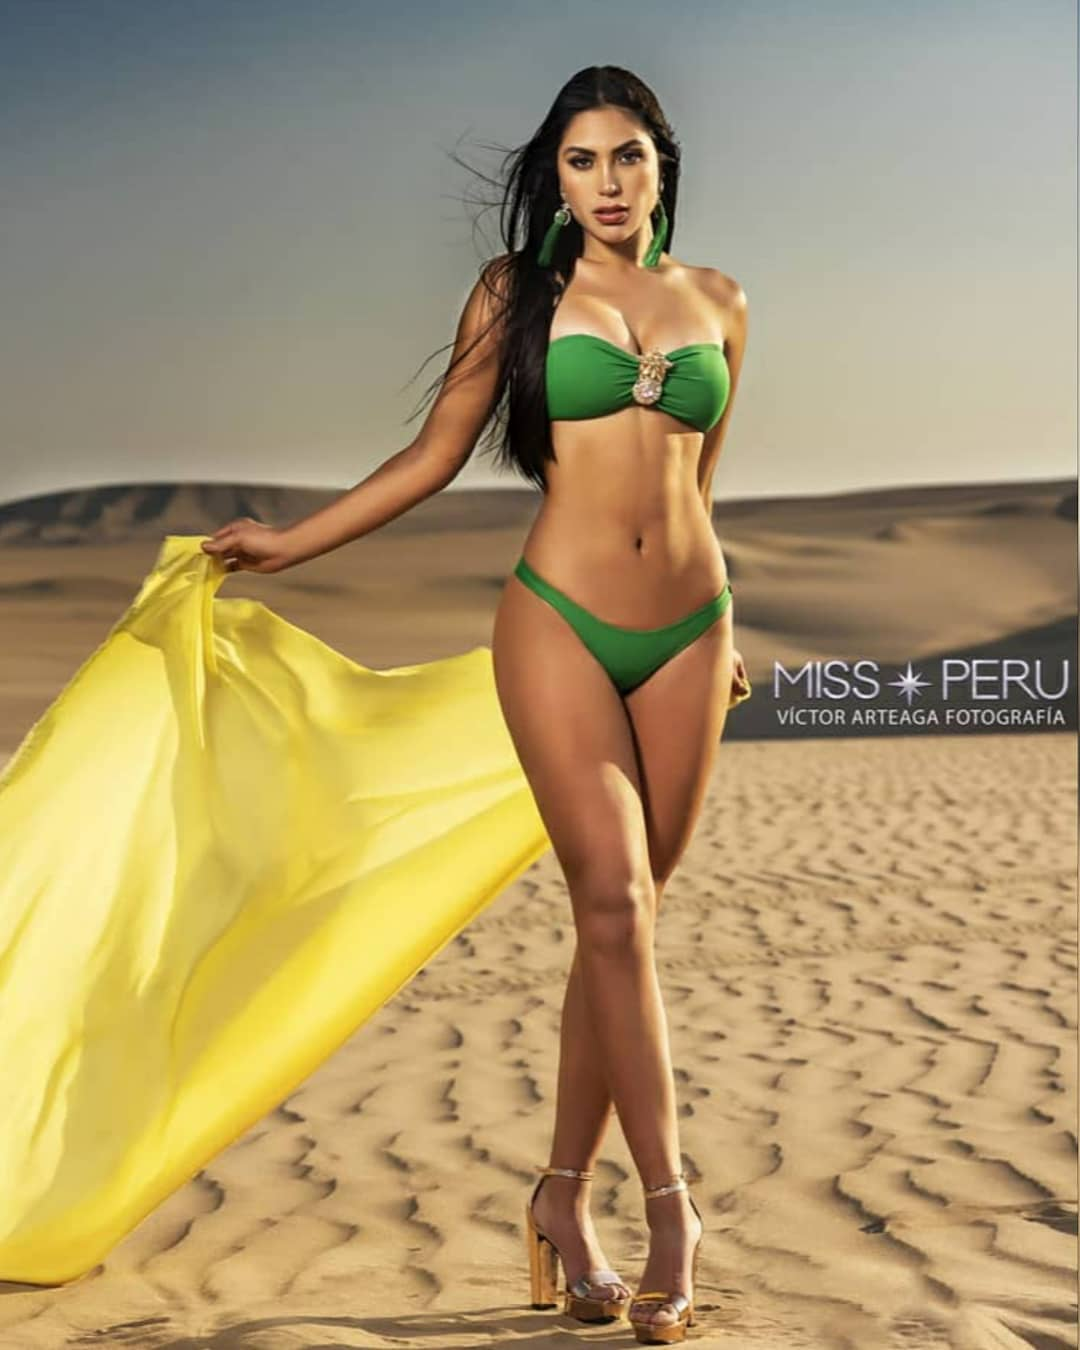 candidatas a miss peru universo 2019. final: 20 oct. - Página 4 63n82ef9